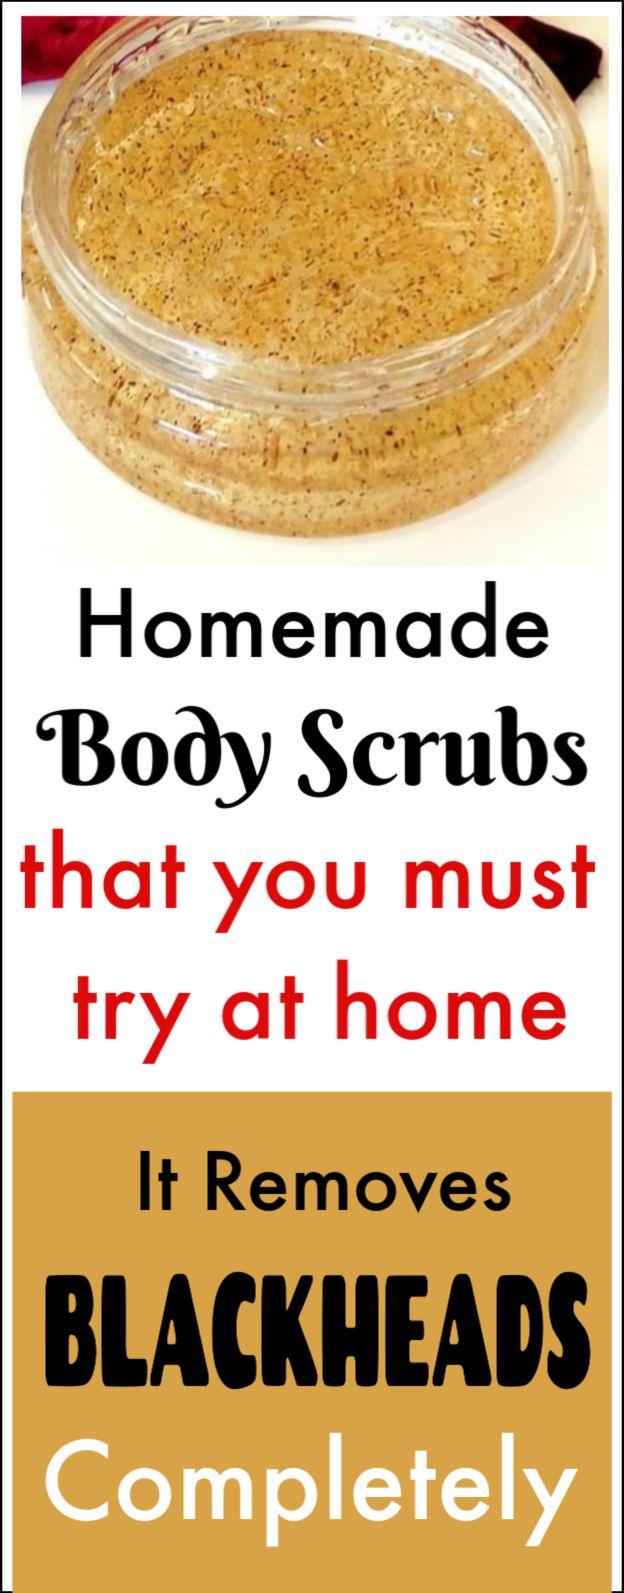 Homemade natural scrubs to get rid of blackheads